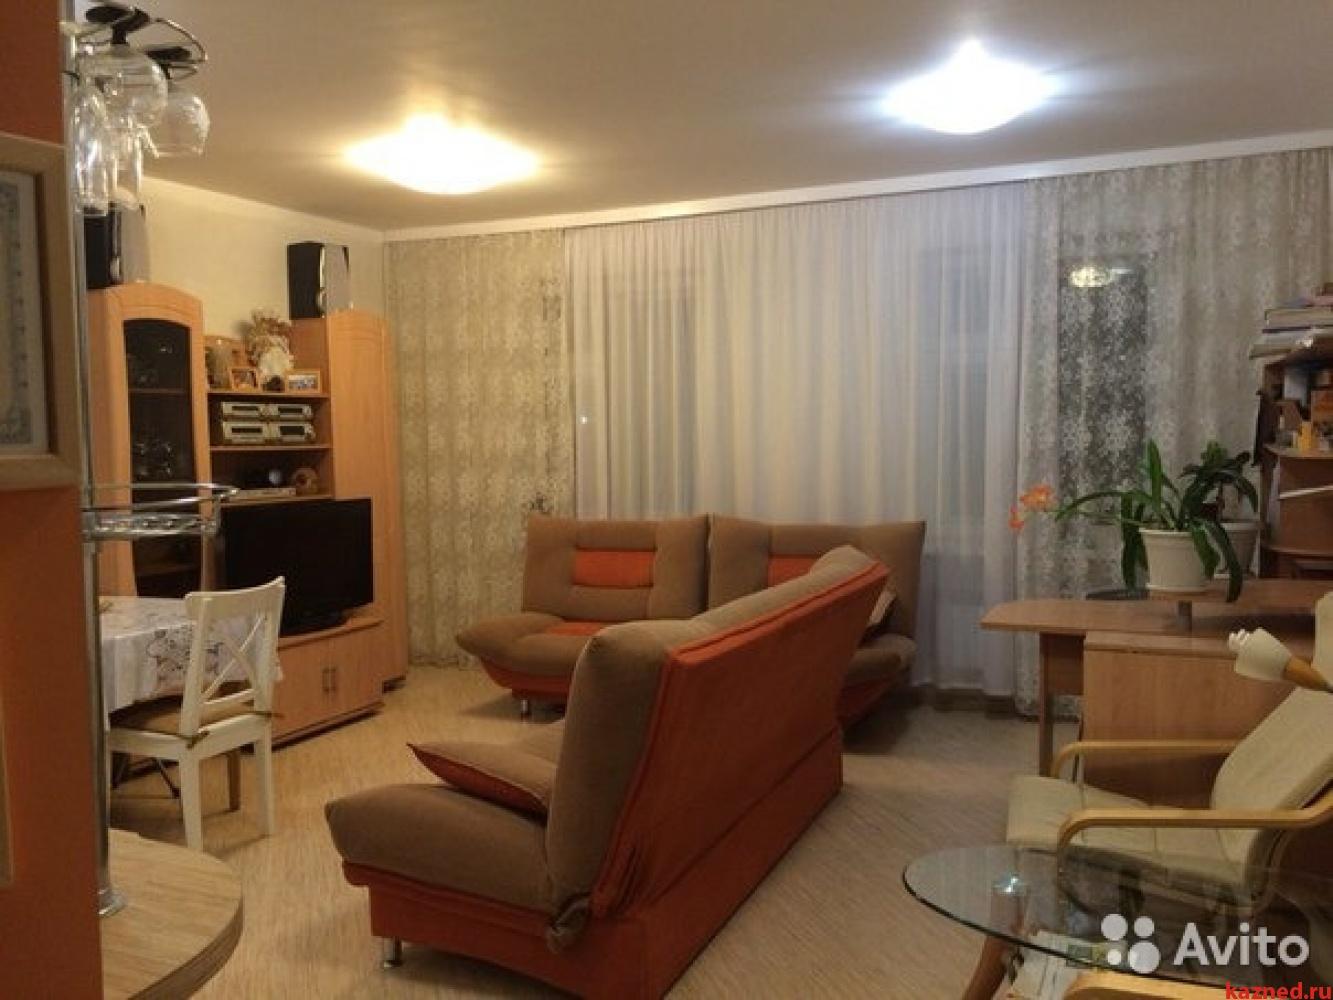 Продажа 2-комн.квартиру Волочаевская. д .6, 69 м2  (миниатюра №2)